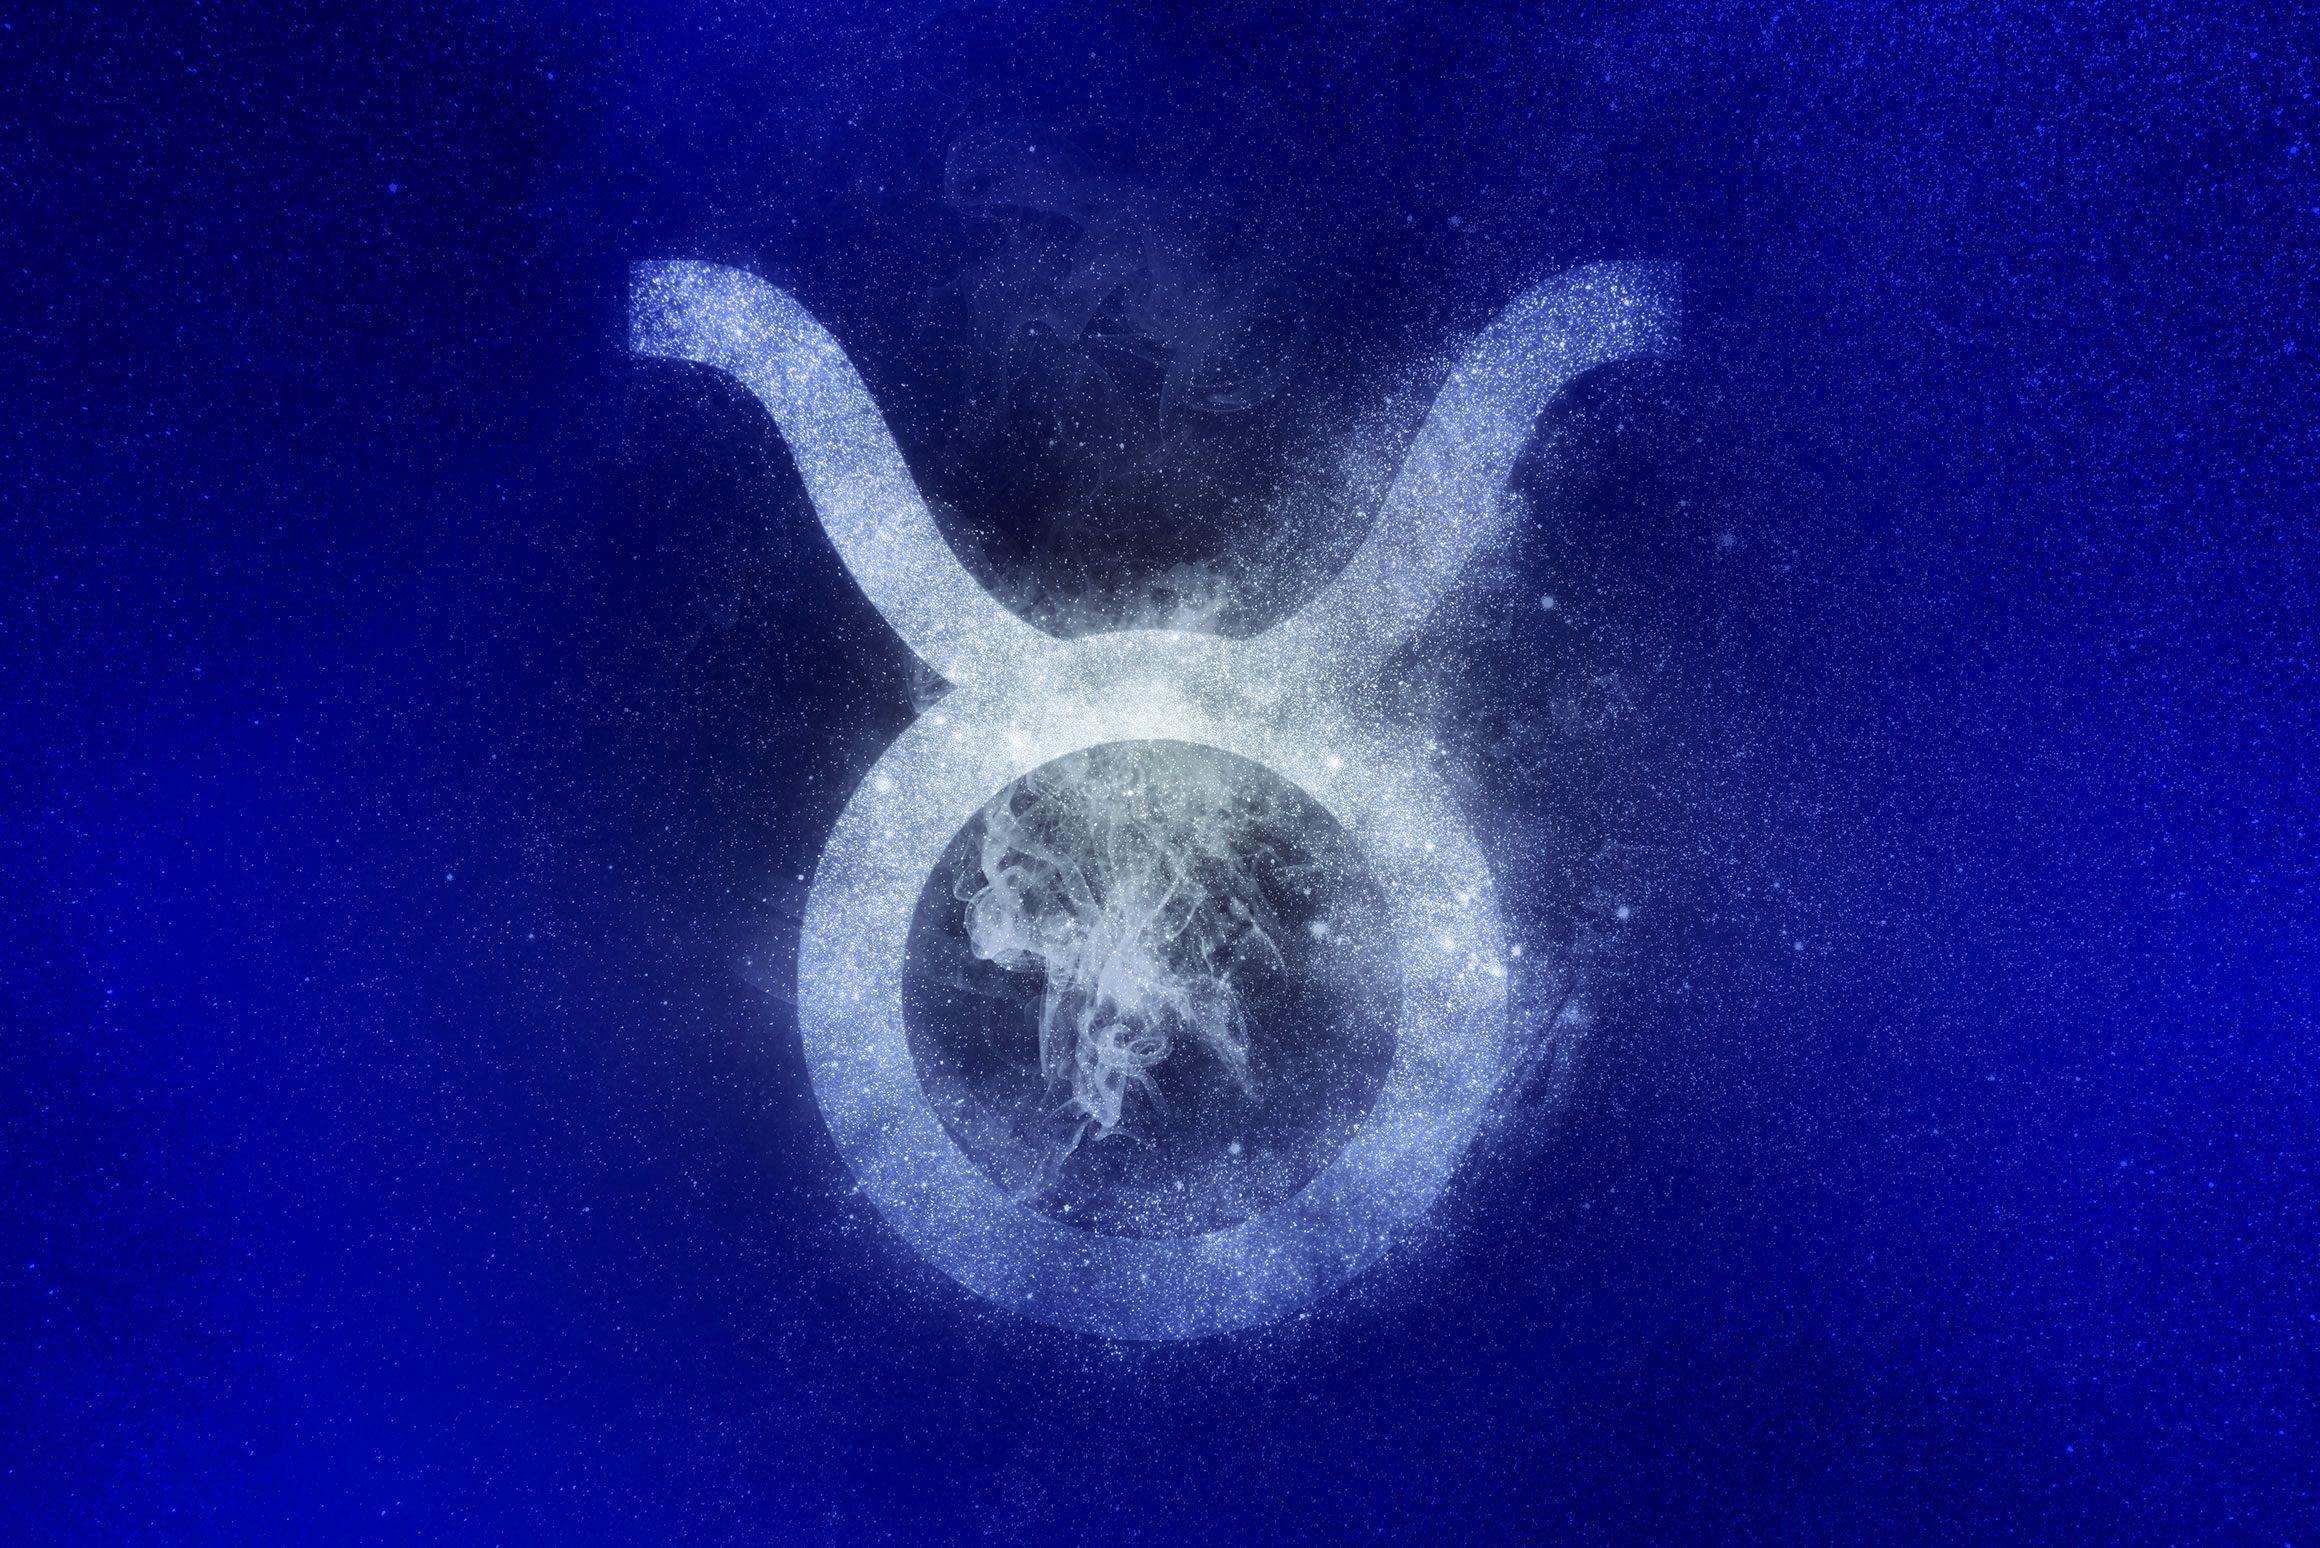 taurus zodiac symbol in winter colors